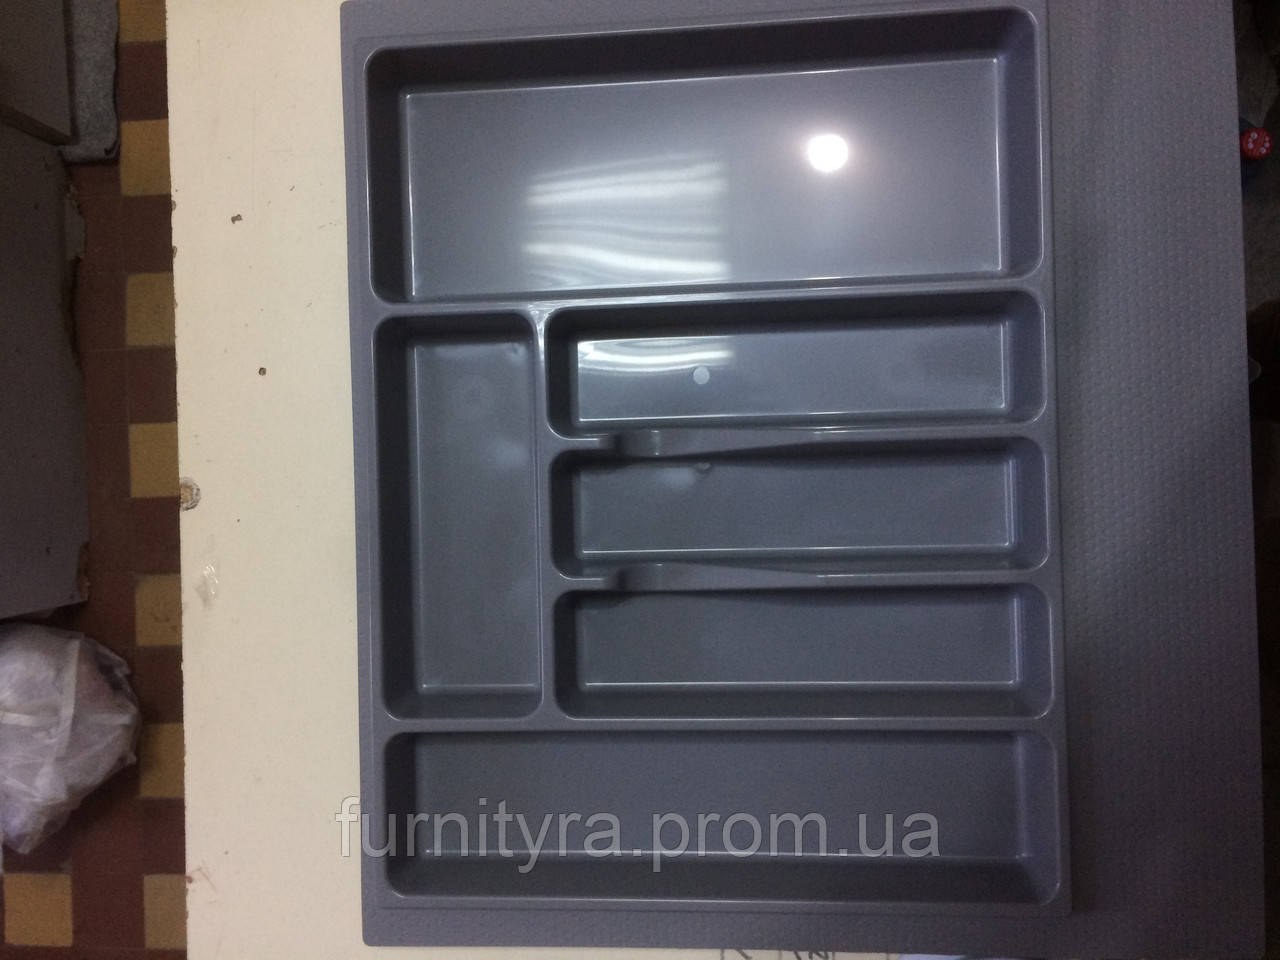 Пенал для кухонных приборов Volpato, серый, 540x490 мм